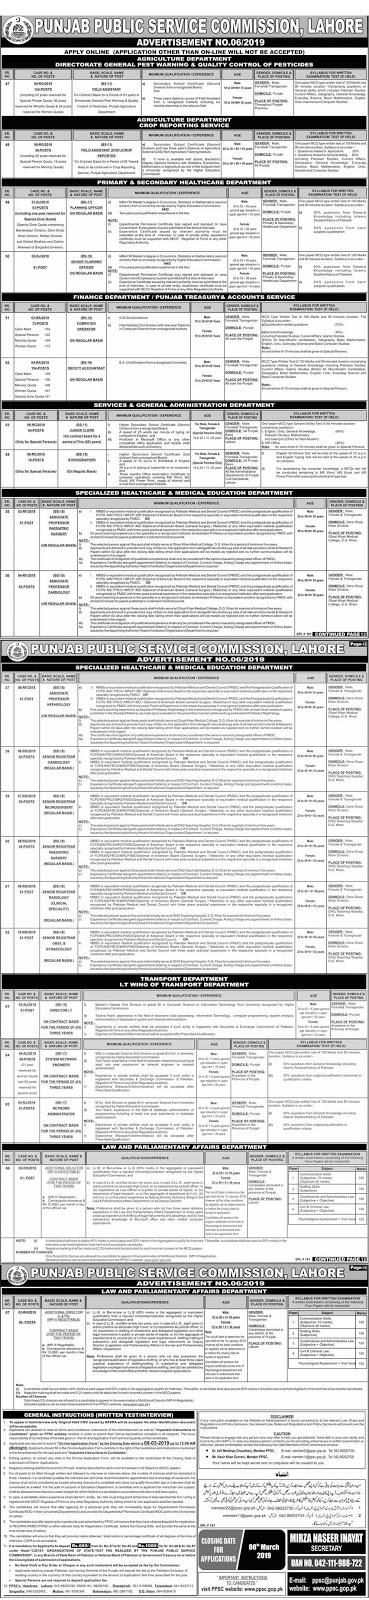 PPSC Jobs, Jobs in PPSC 2019, PPSC Jobs Advertisement No 06 | Jobs in PPSC 21 February 2019